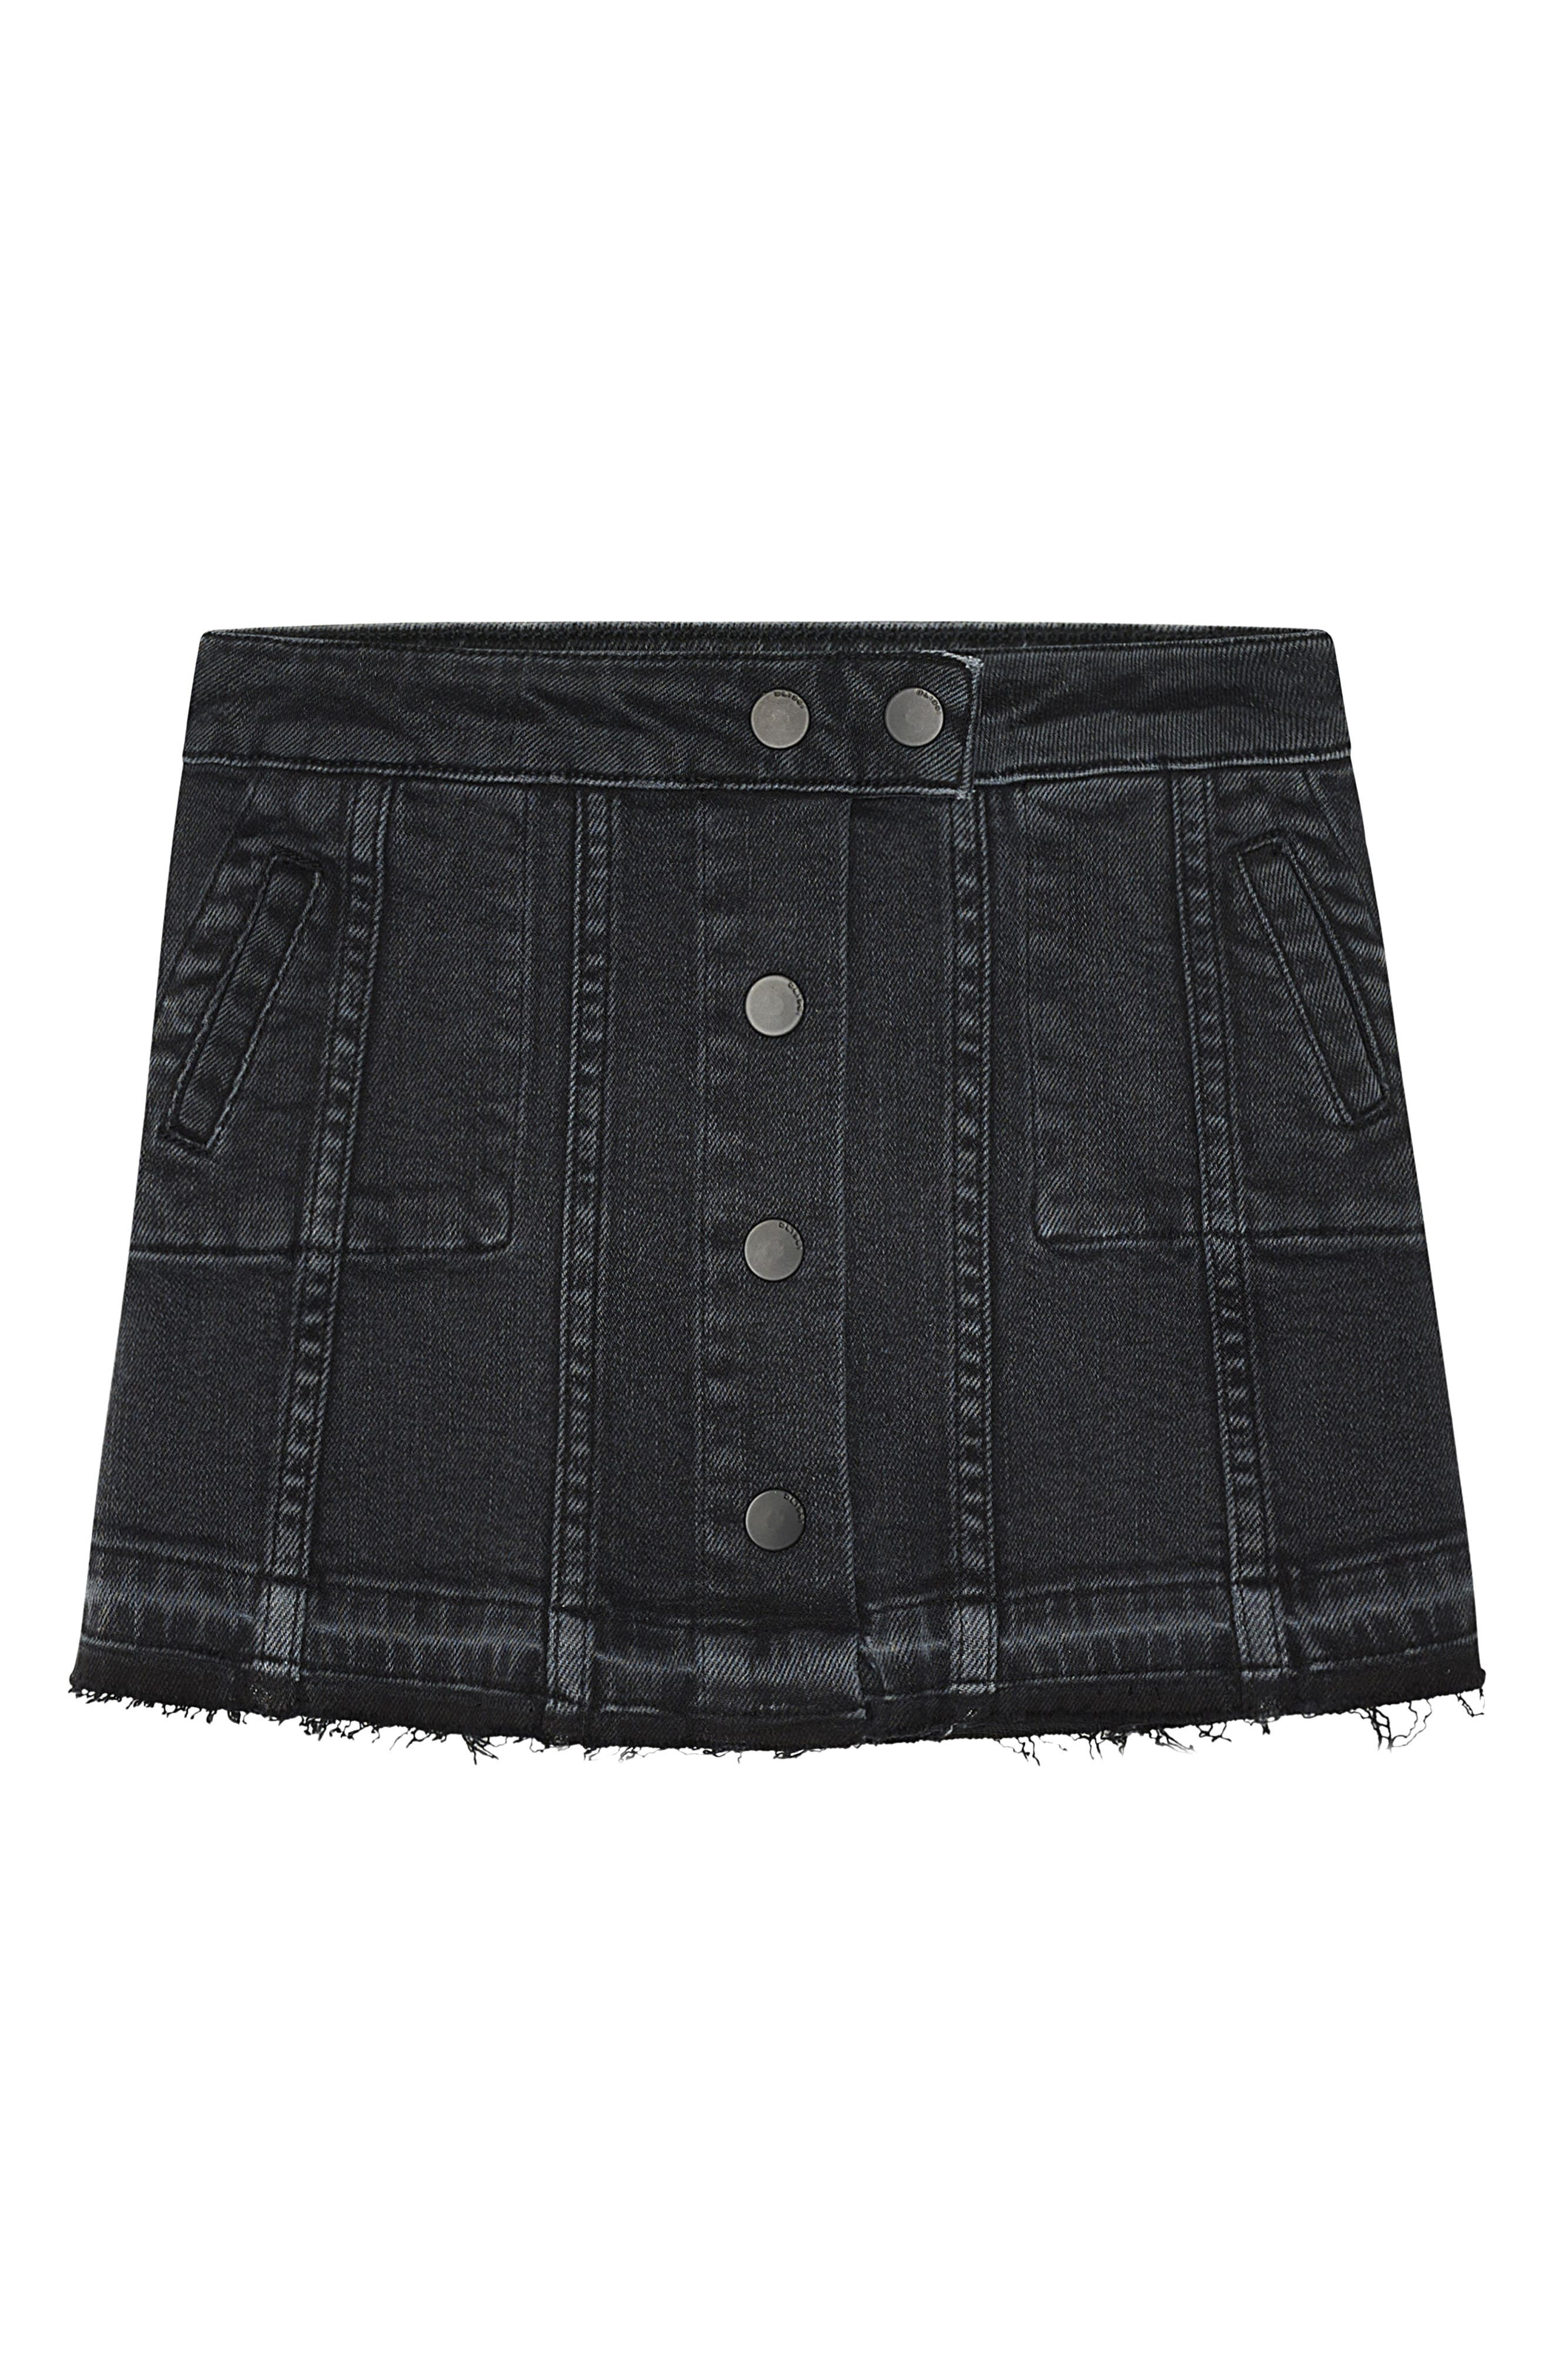 Alternate Image 1 Selected - DL1961 Jenny Cutoff Denim Skirt (Big Girls)